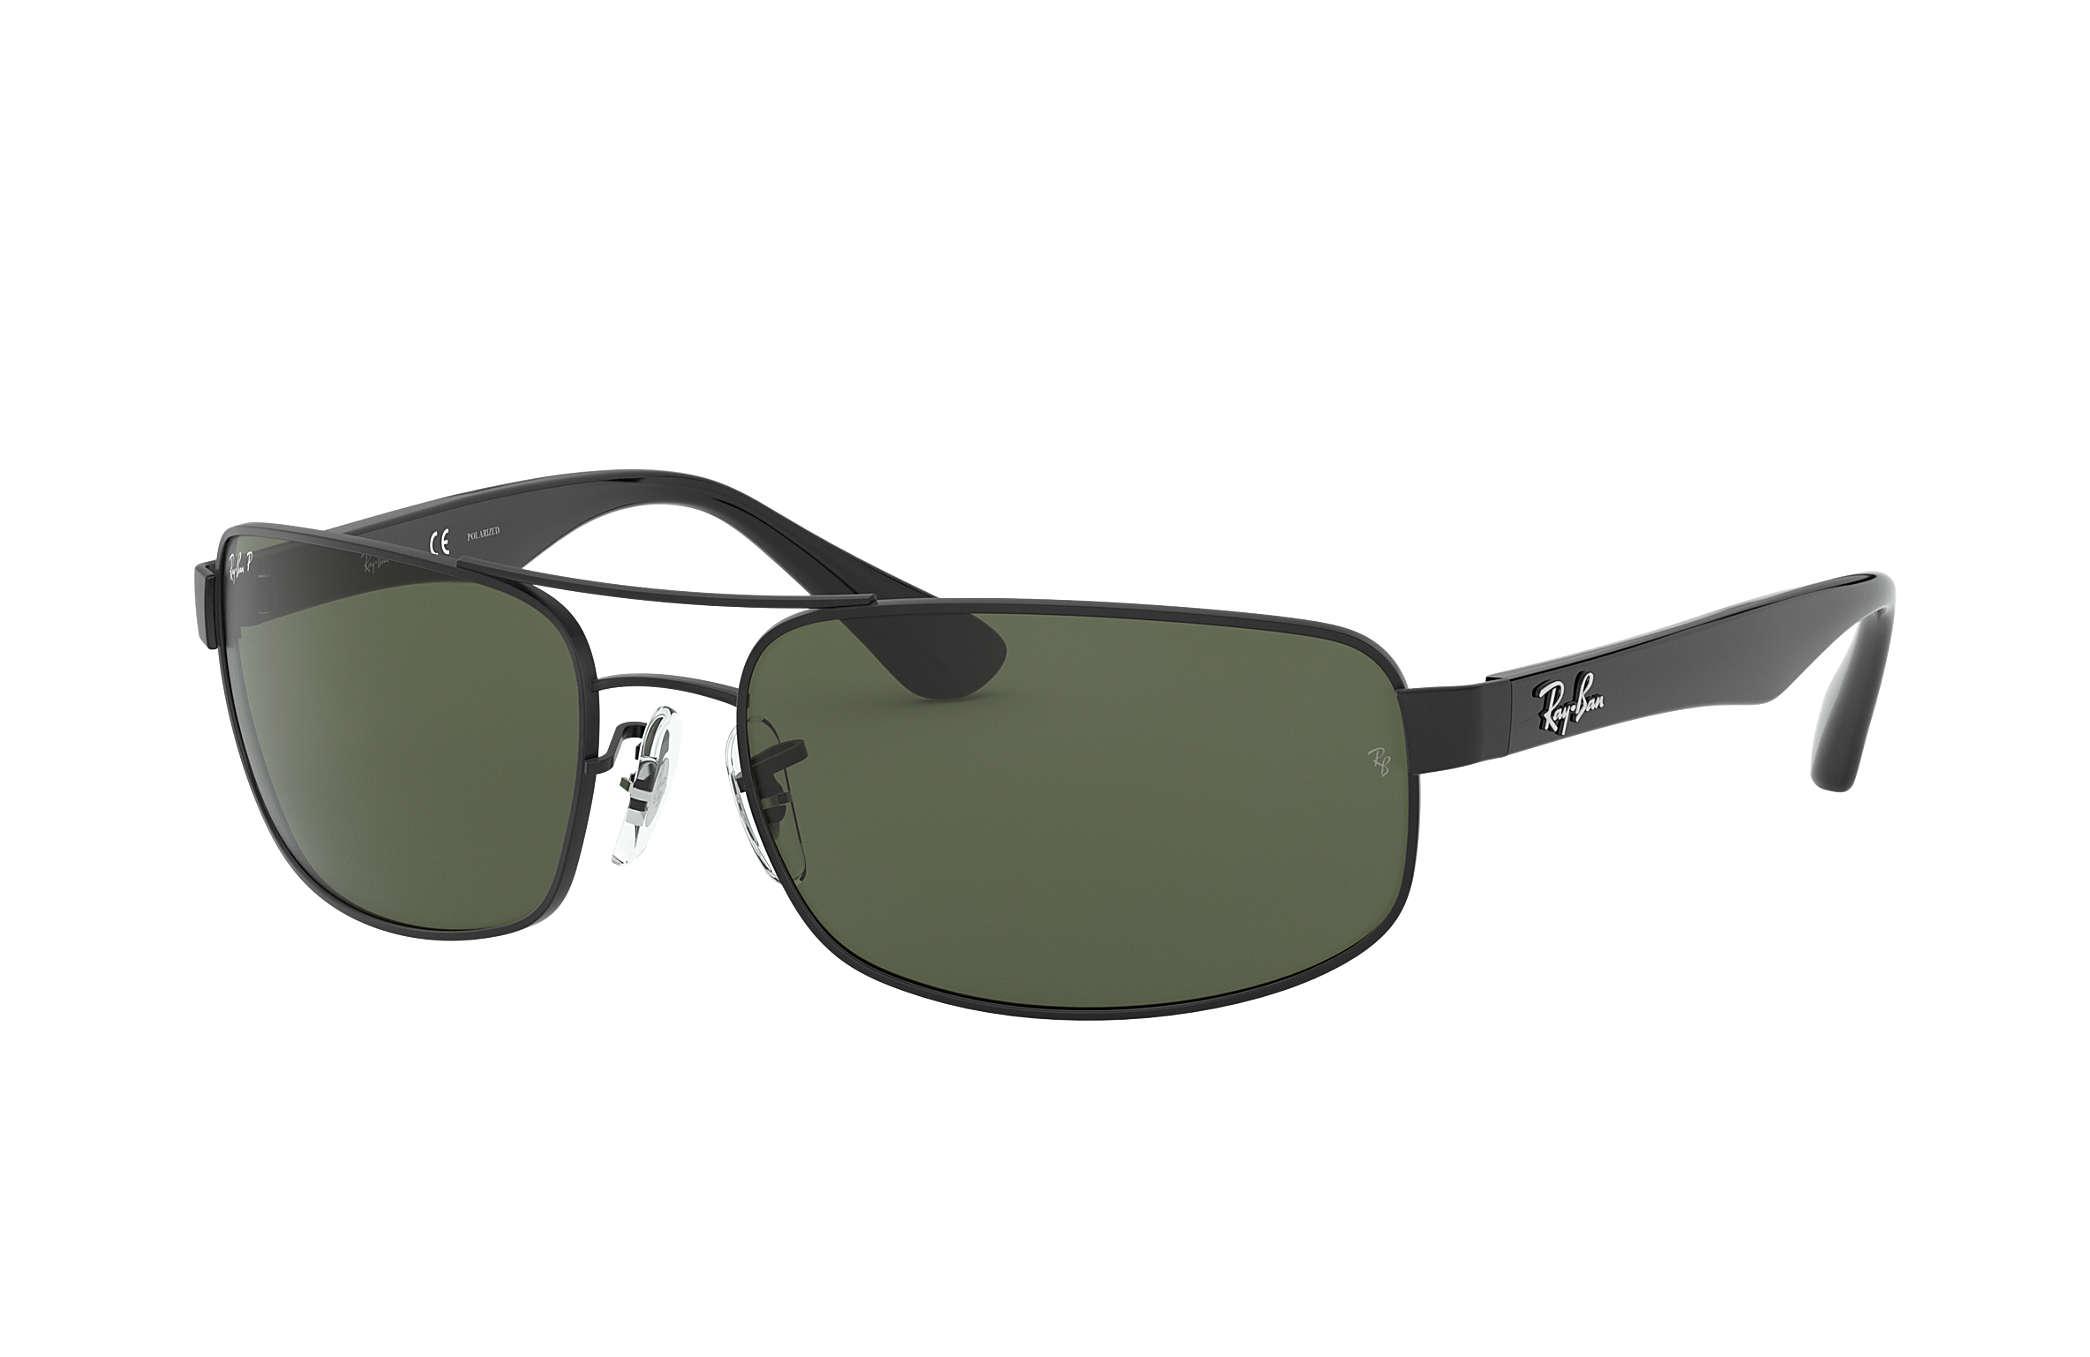 Ray-Ban RB3445 Black - Metal - Green Polarized Lenses - 0RB3445002 ... 97476220d8